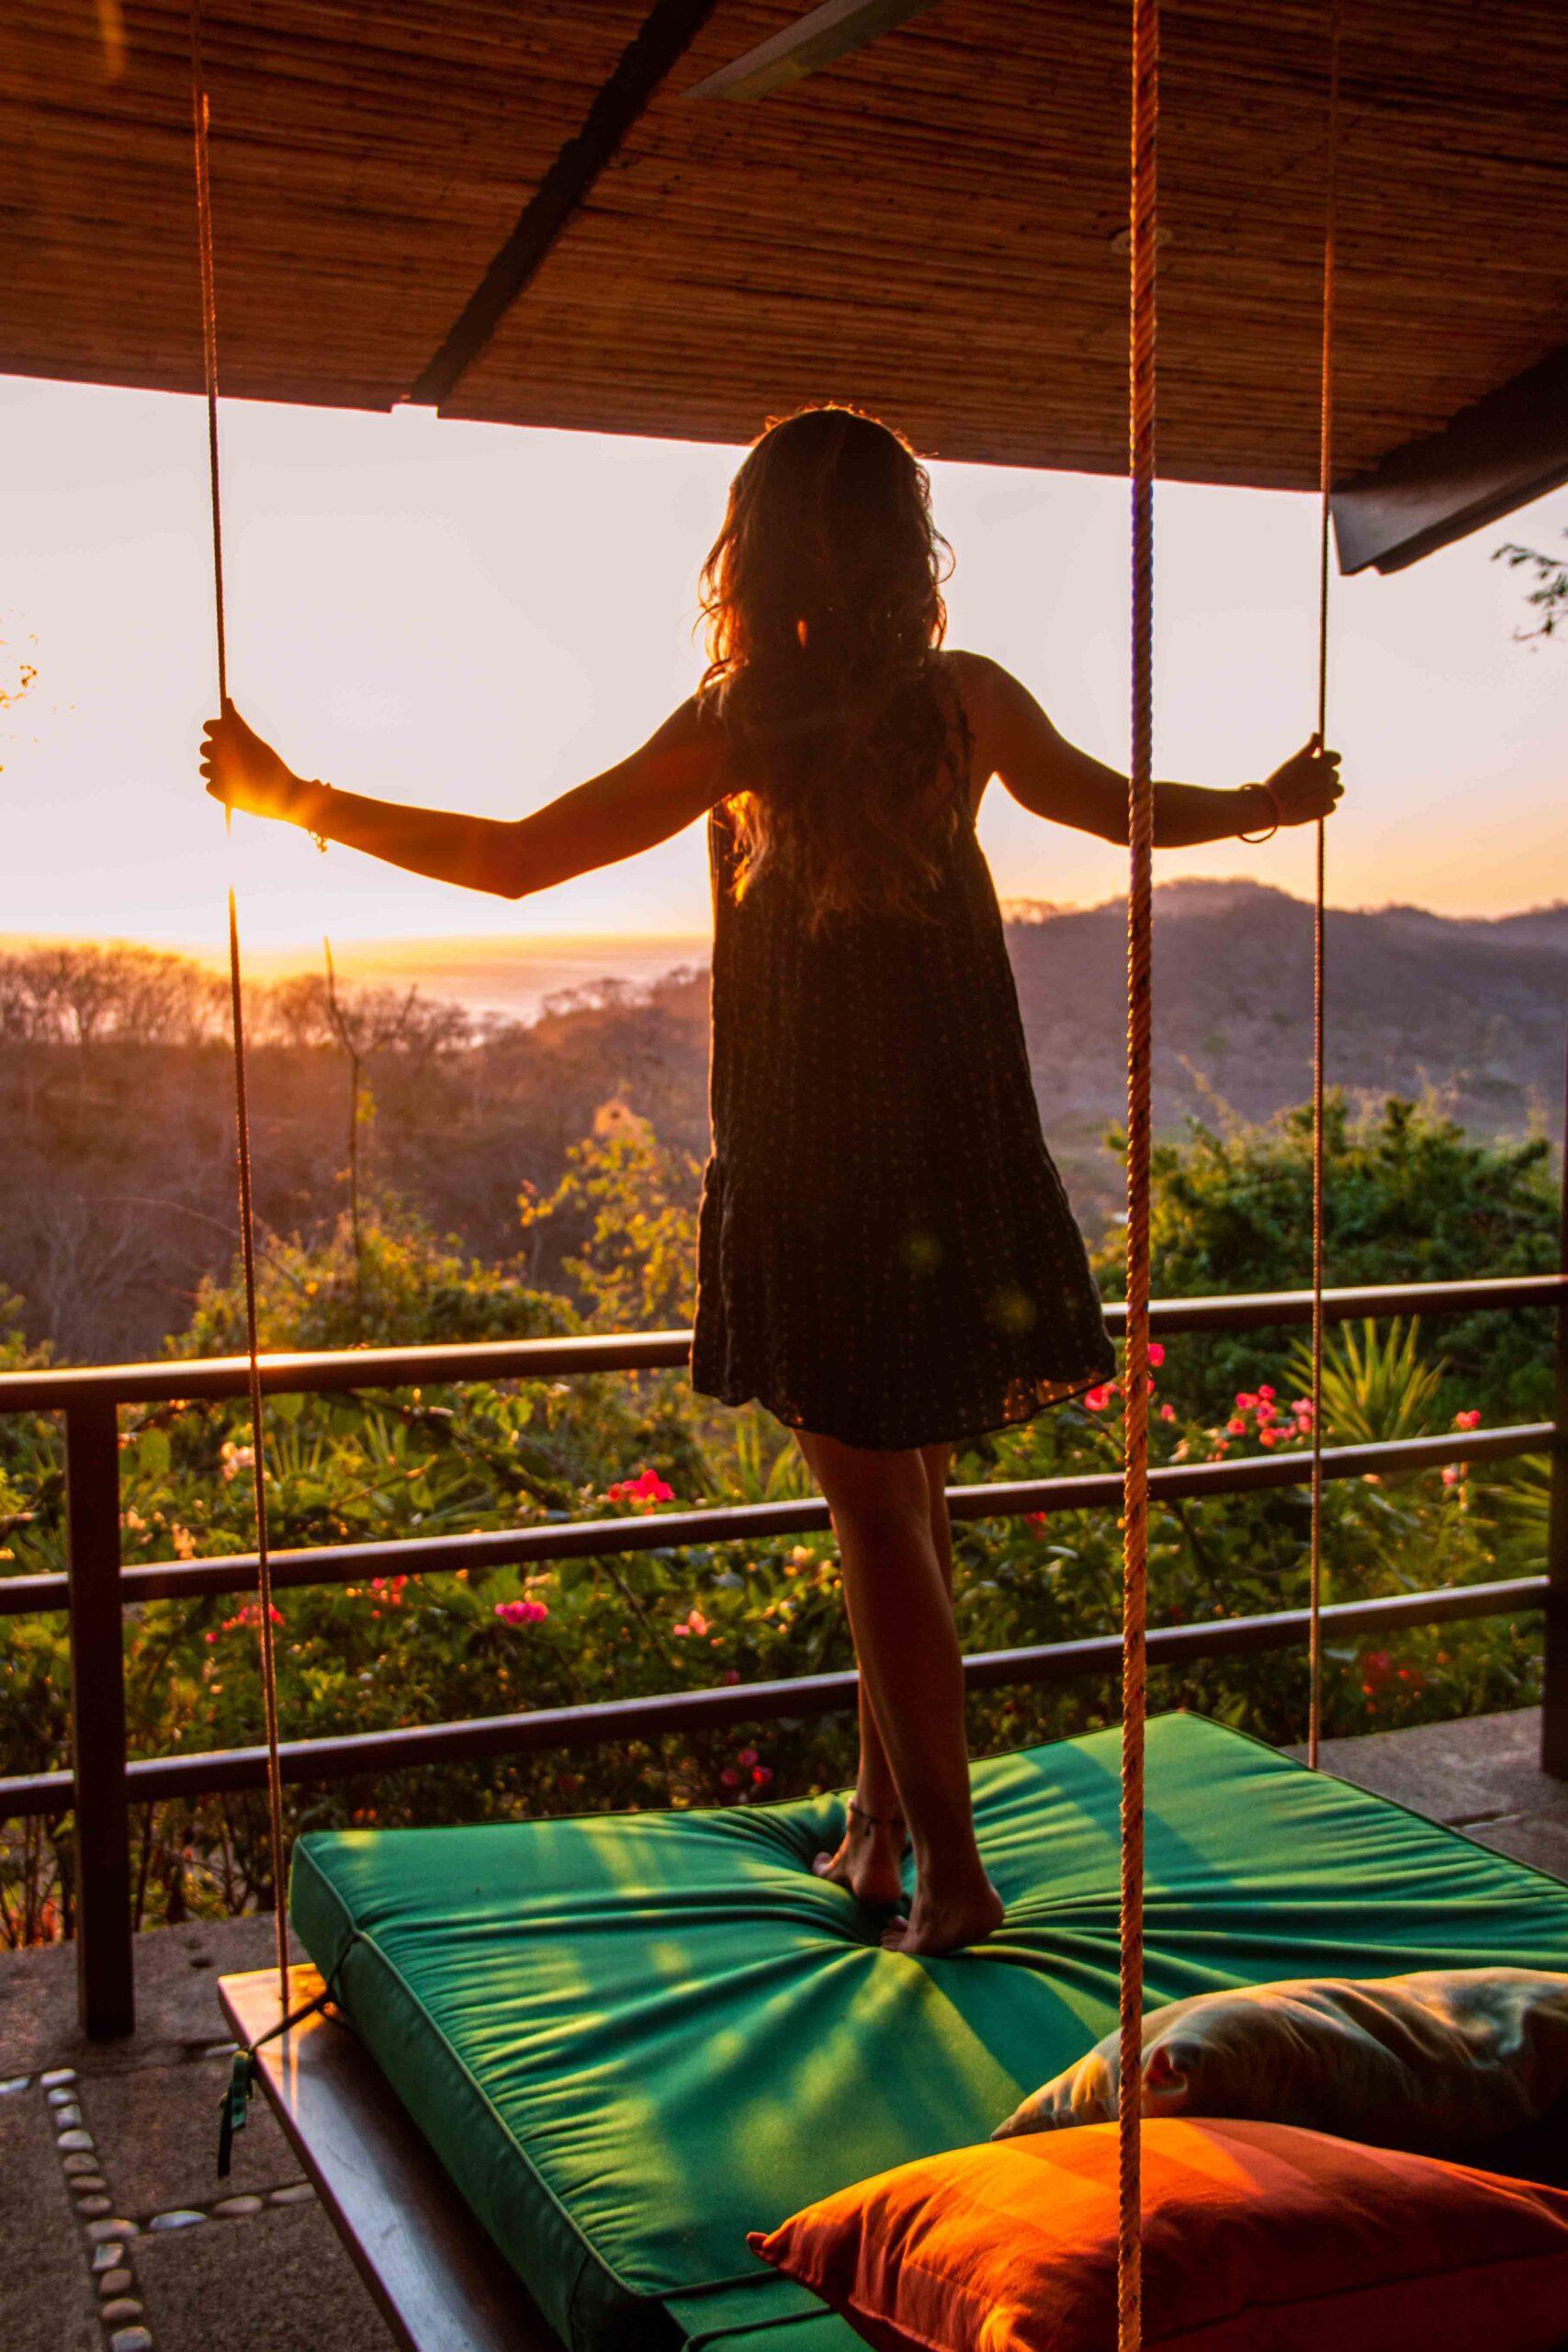 Sunset view from Balcones de Majagual in Nicaragua